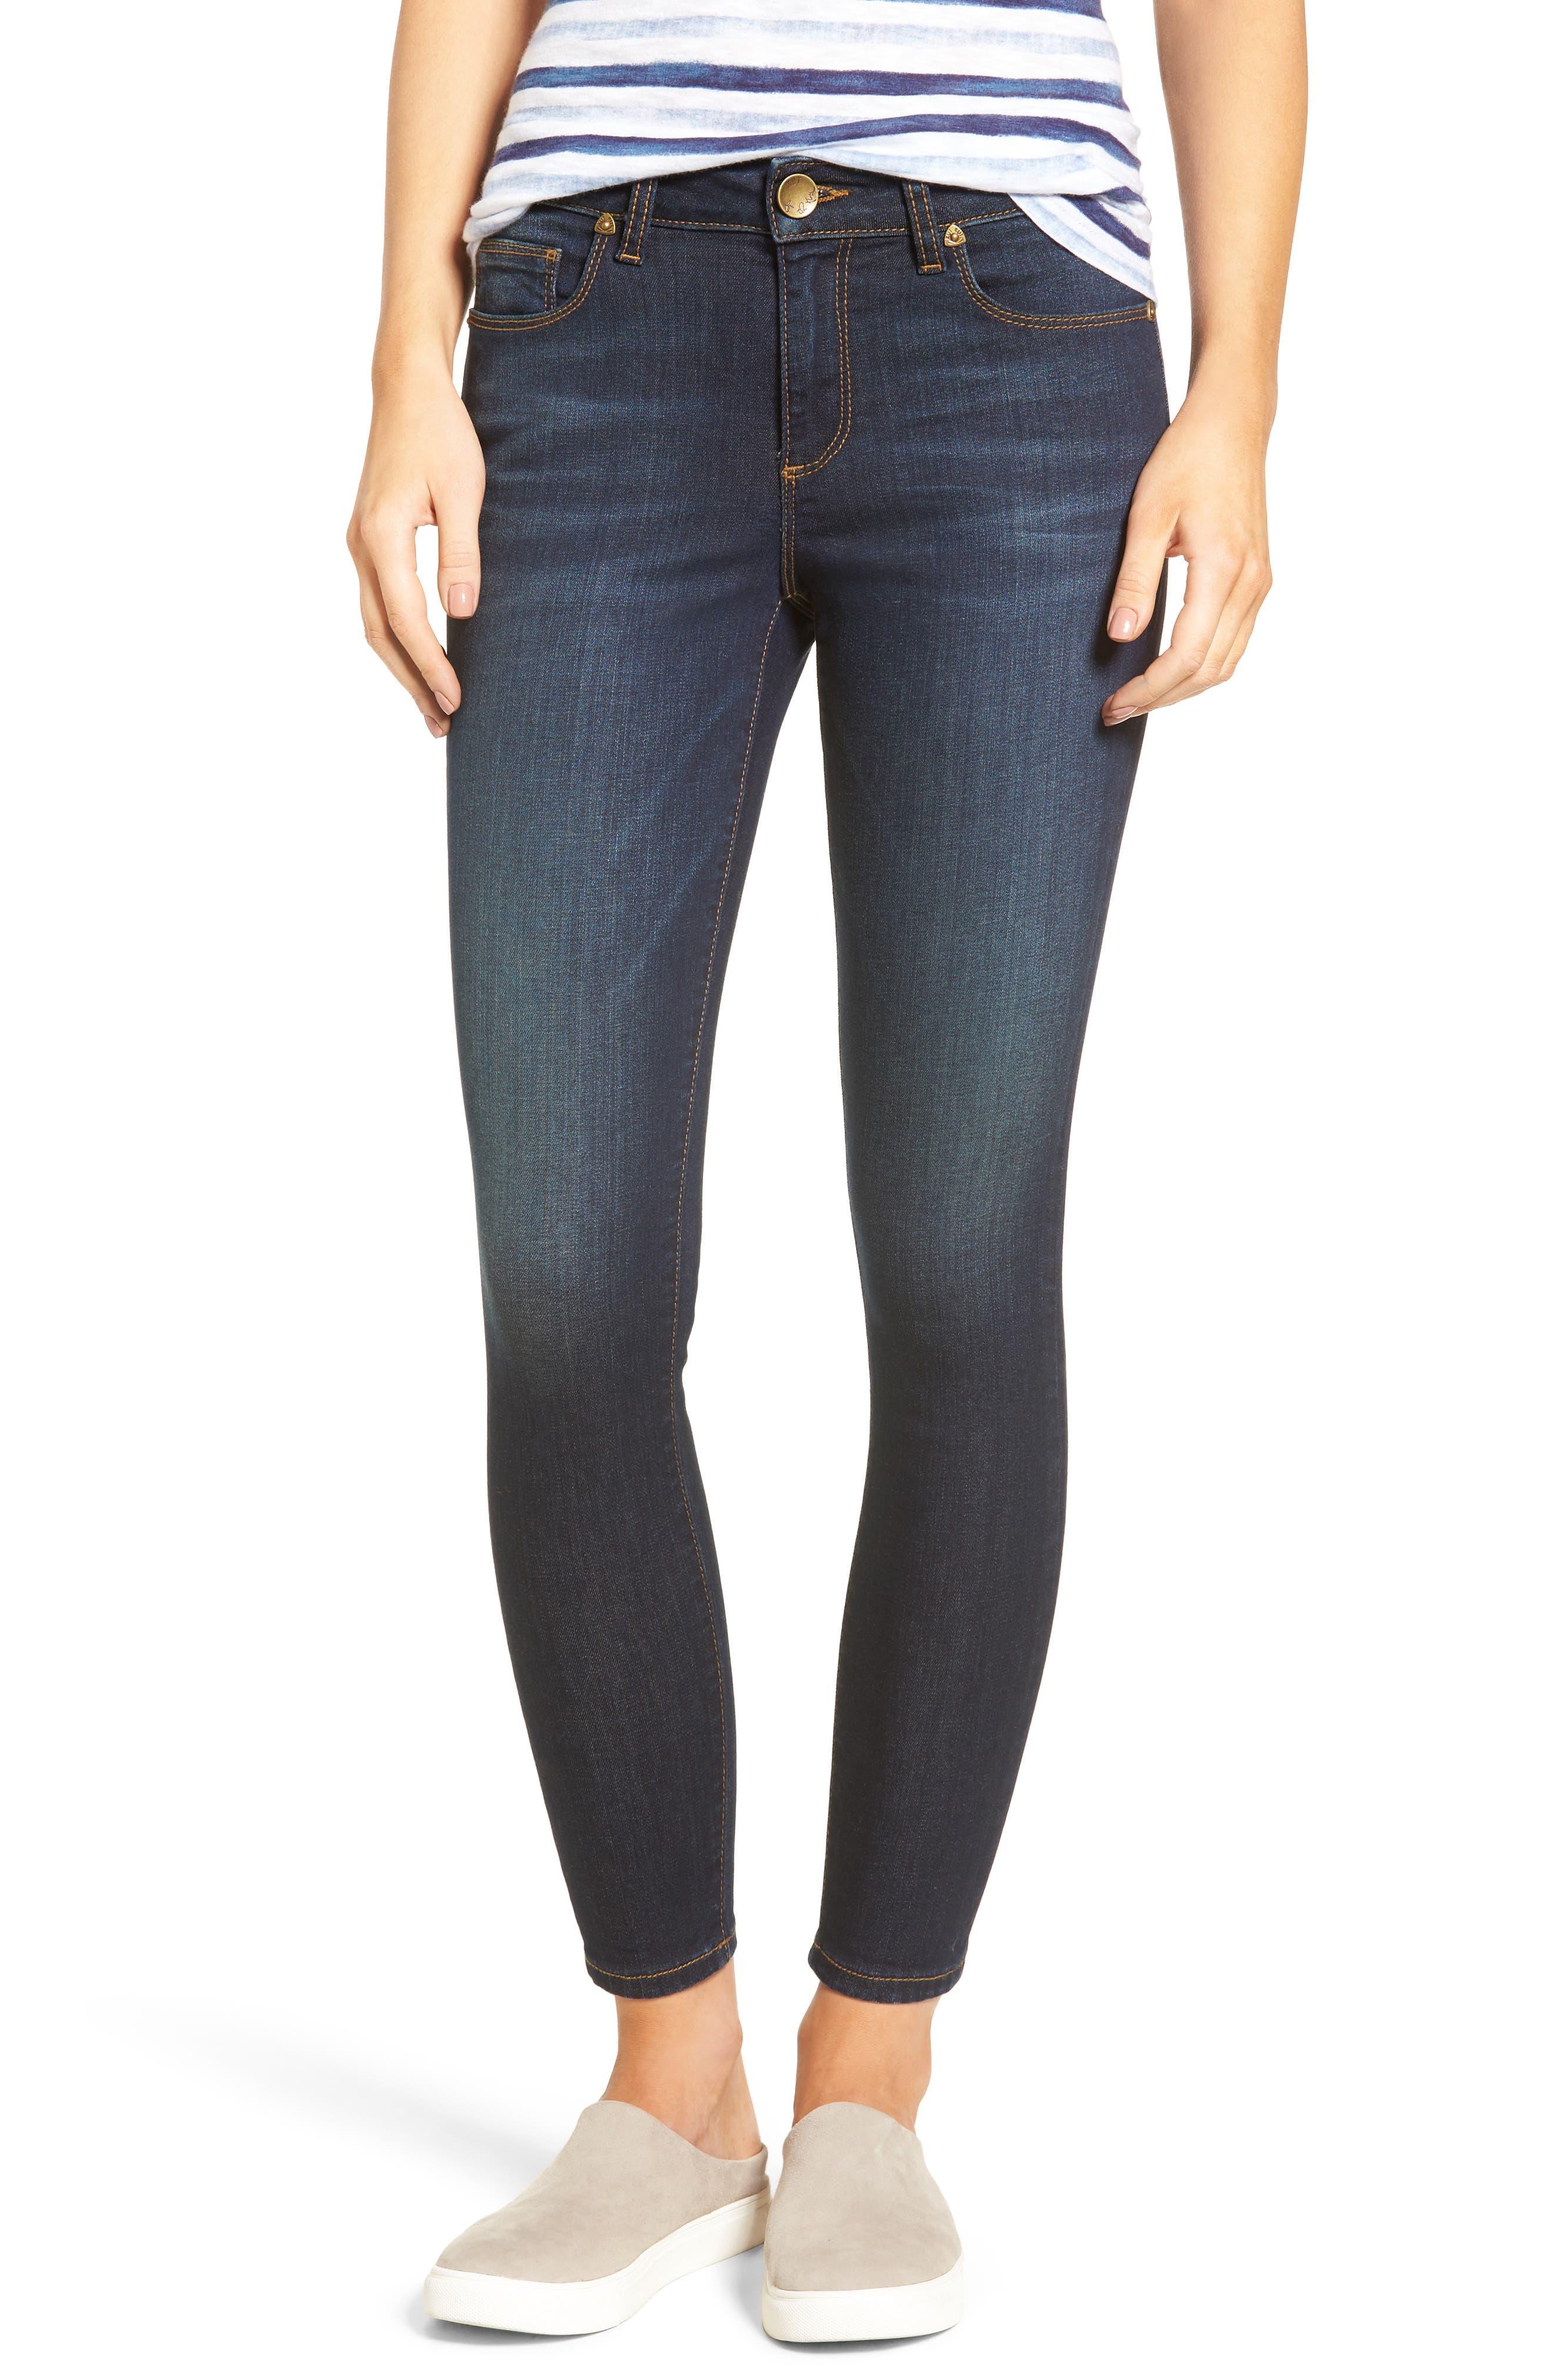 Alternate Image 1 Selected - KUT from the Kloth Kurvy Ankle Skinny Jeans (Blinding)